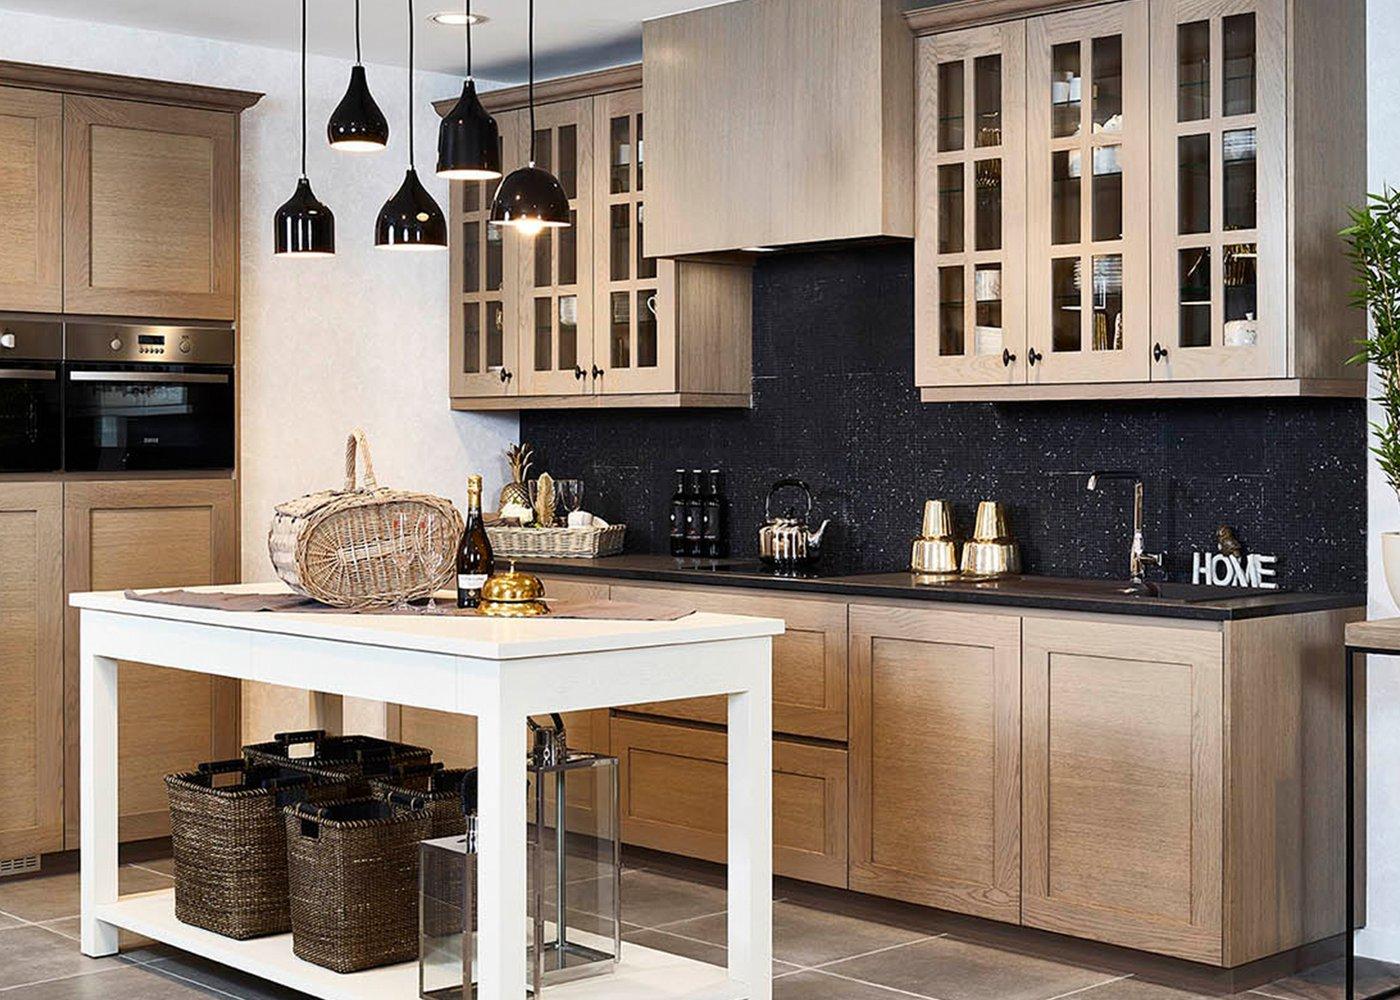 Rustieke keuken in eik - Model New York